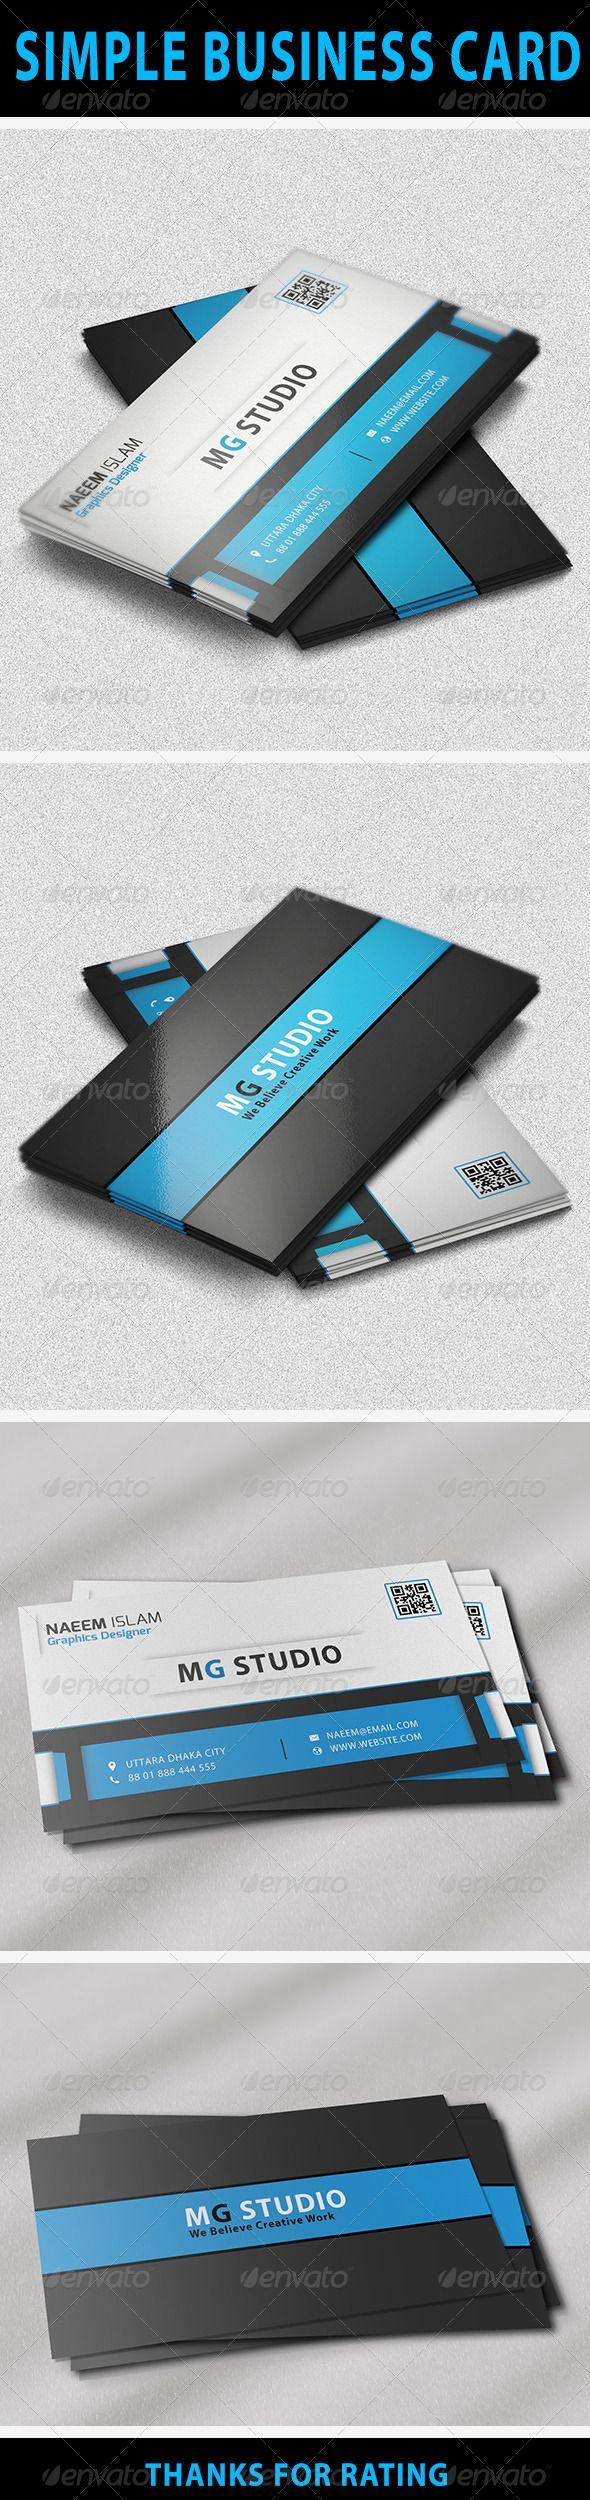 48 best CMYK images on Pinterest | Business card design, Business ...